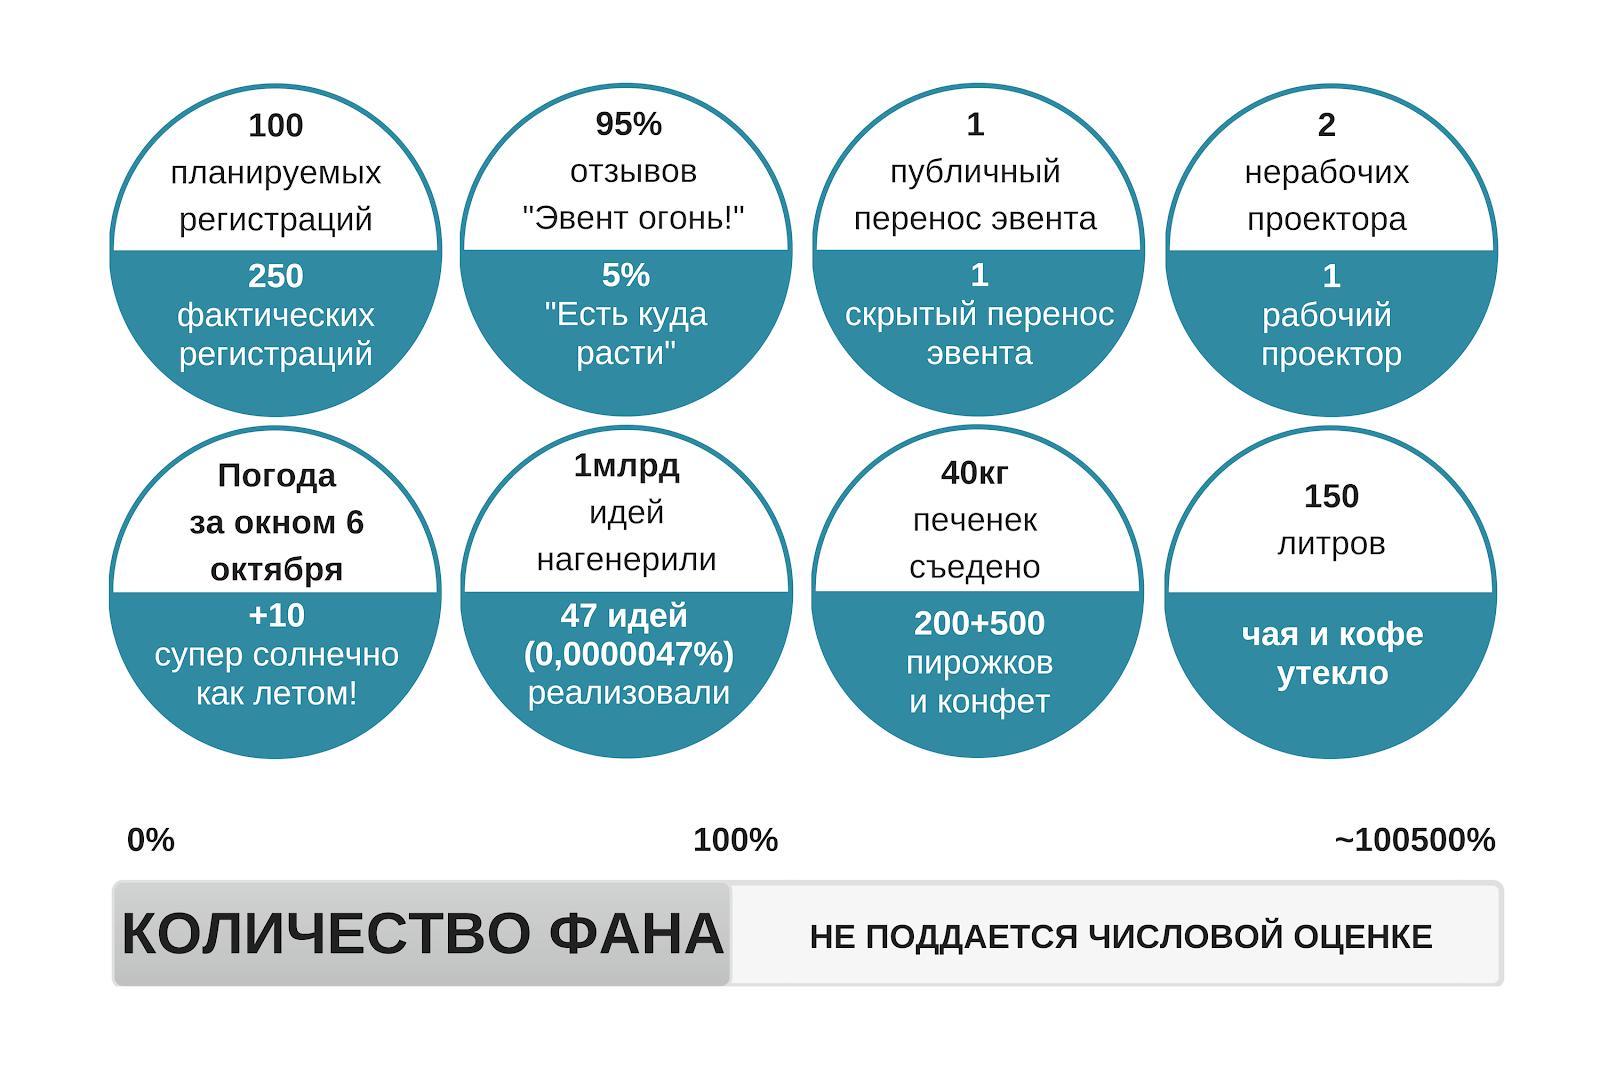 Сибирское саппорт-комьюнити: начало - 5